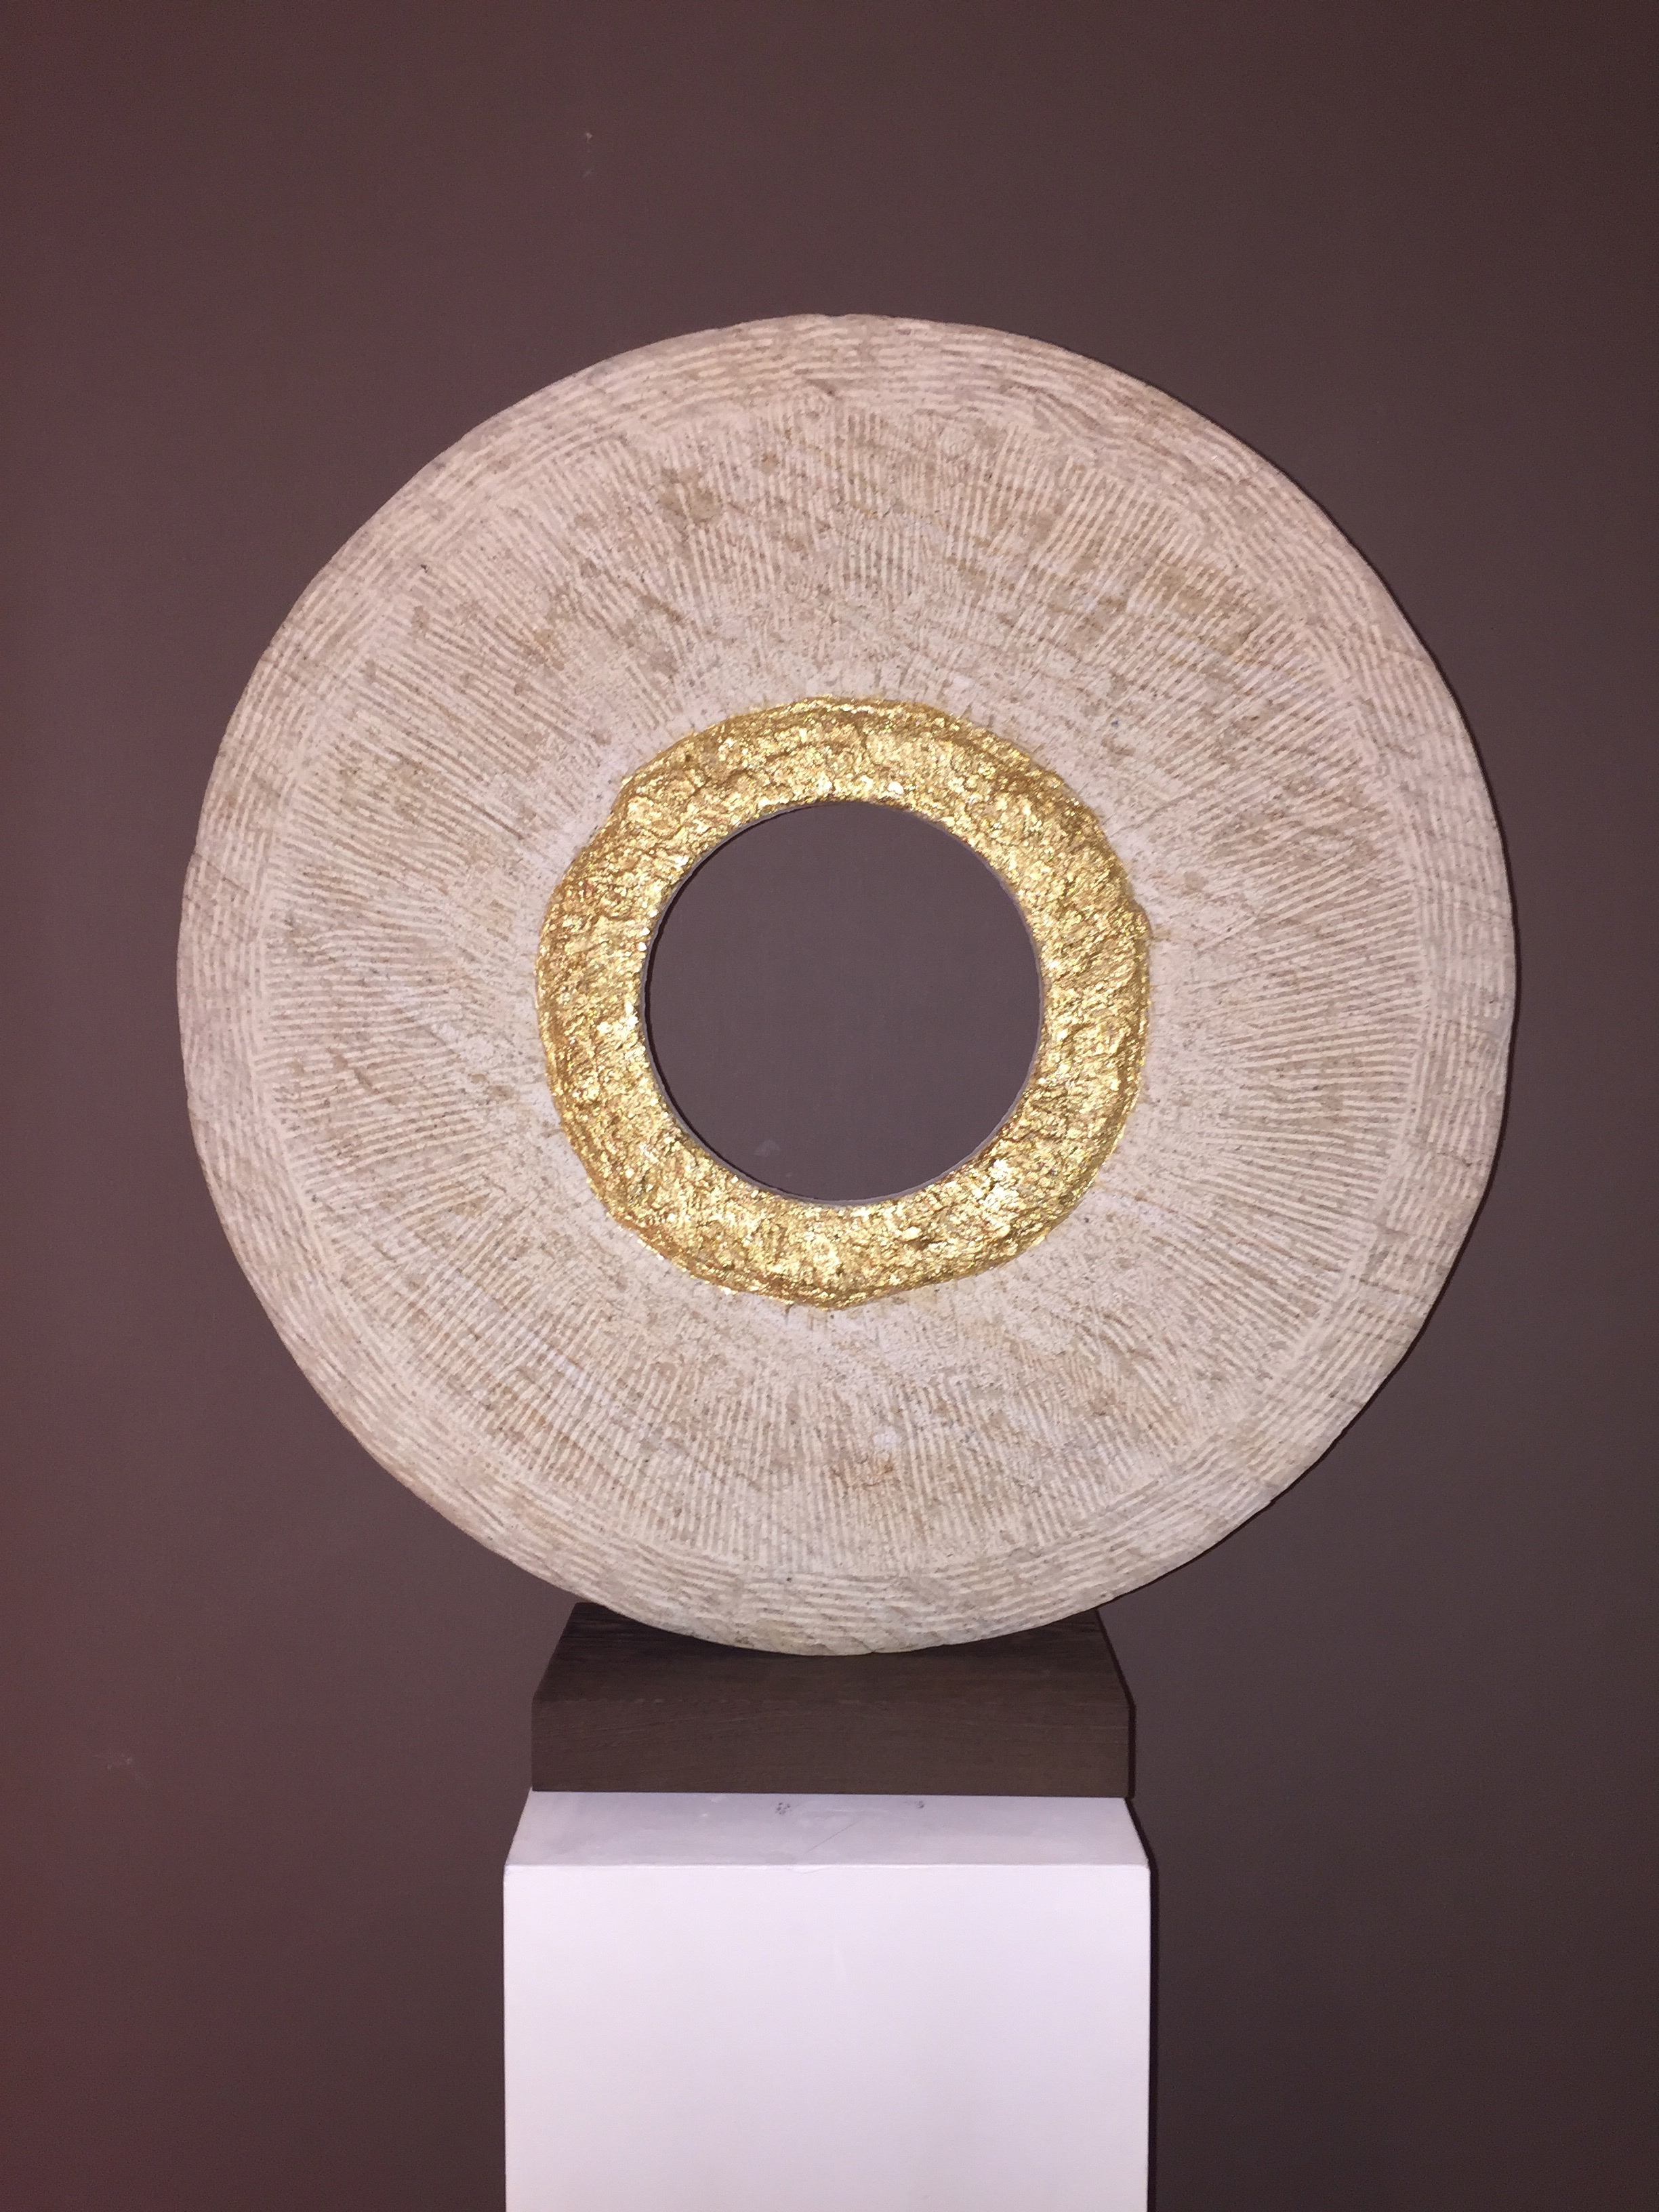 "GOLD RING 26"" / 66cm"